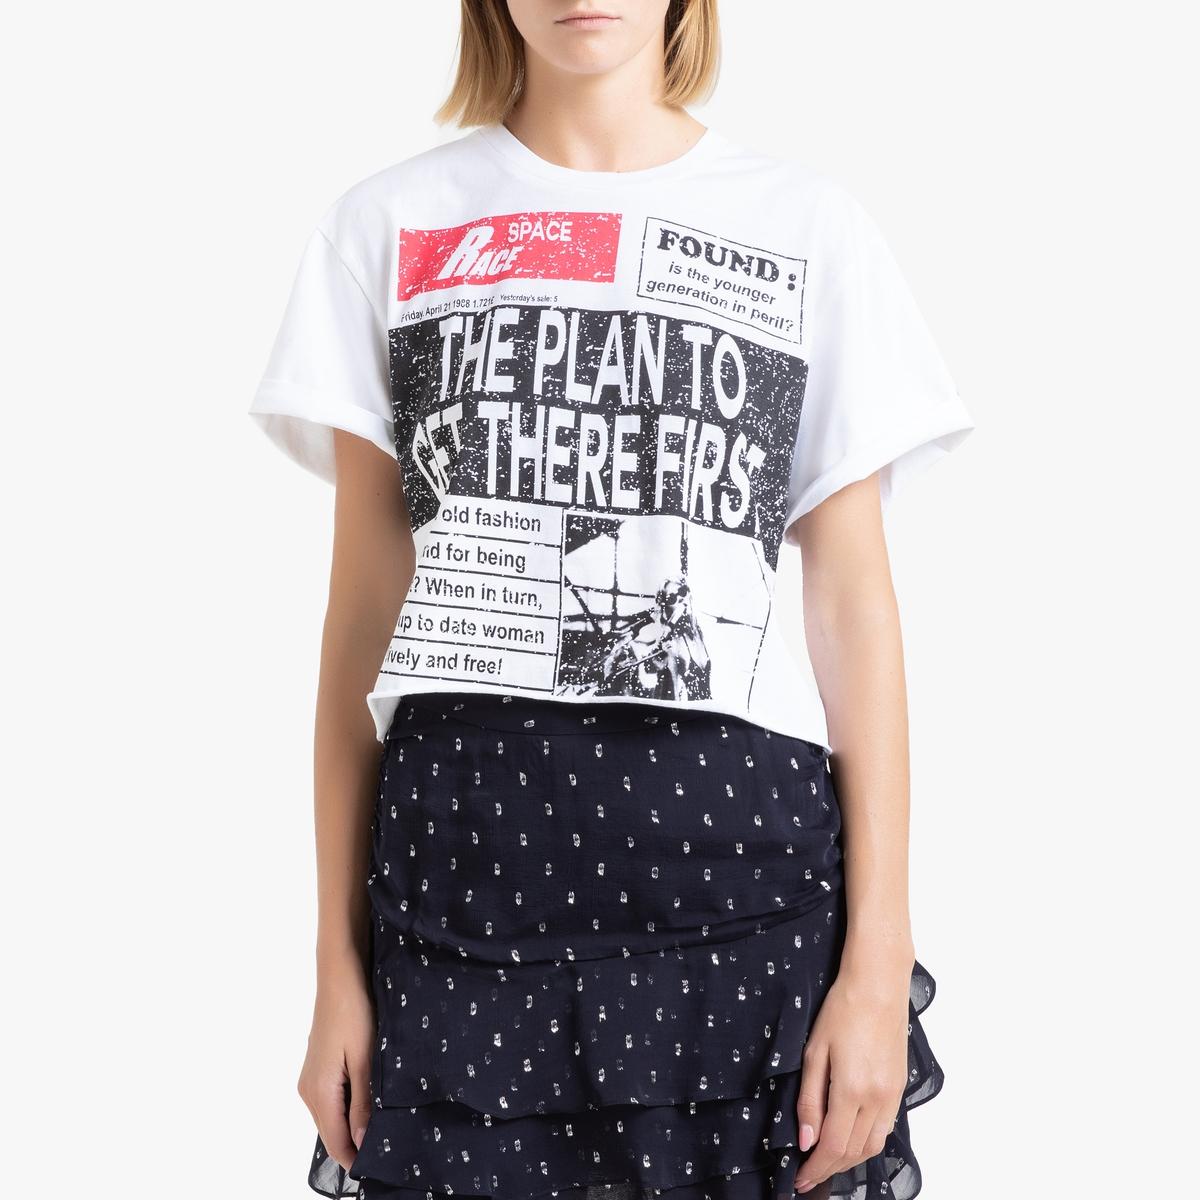 Camiseta corta con cuello redondo y manga corta